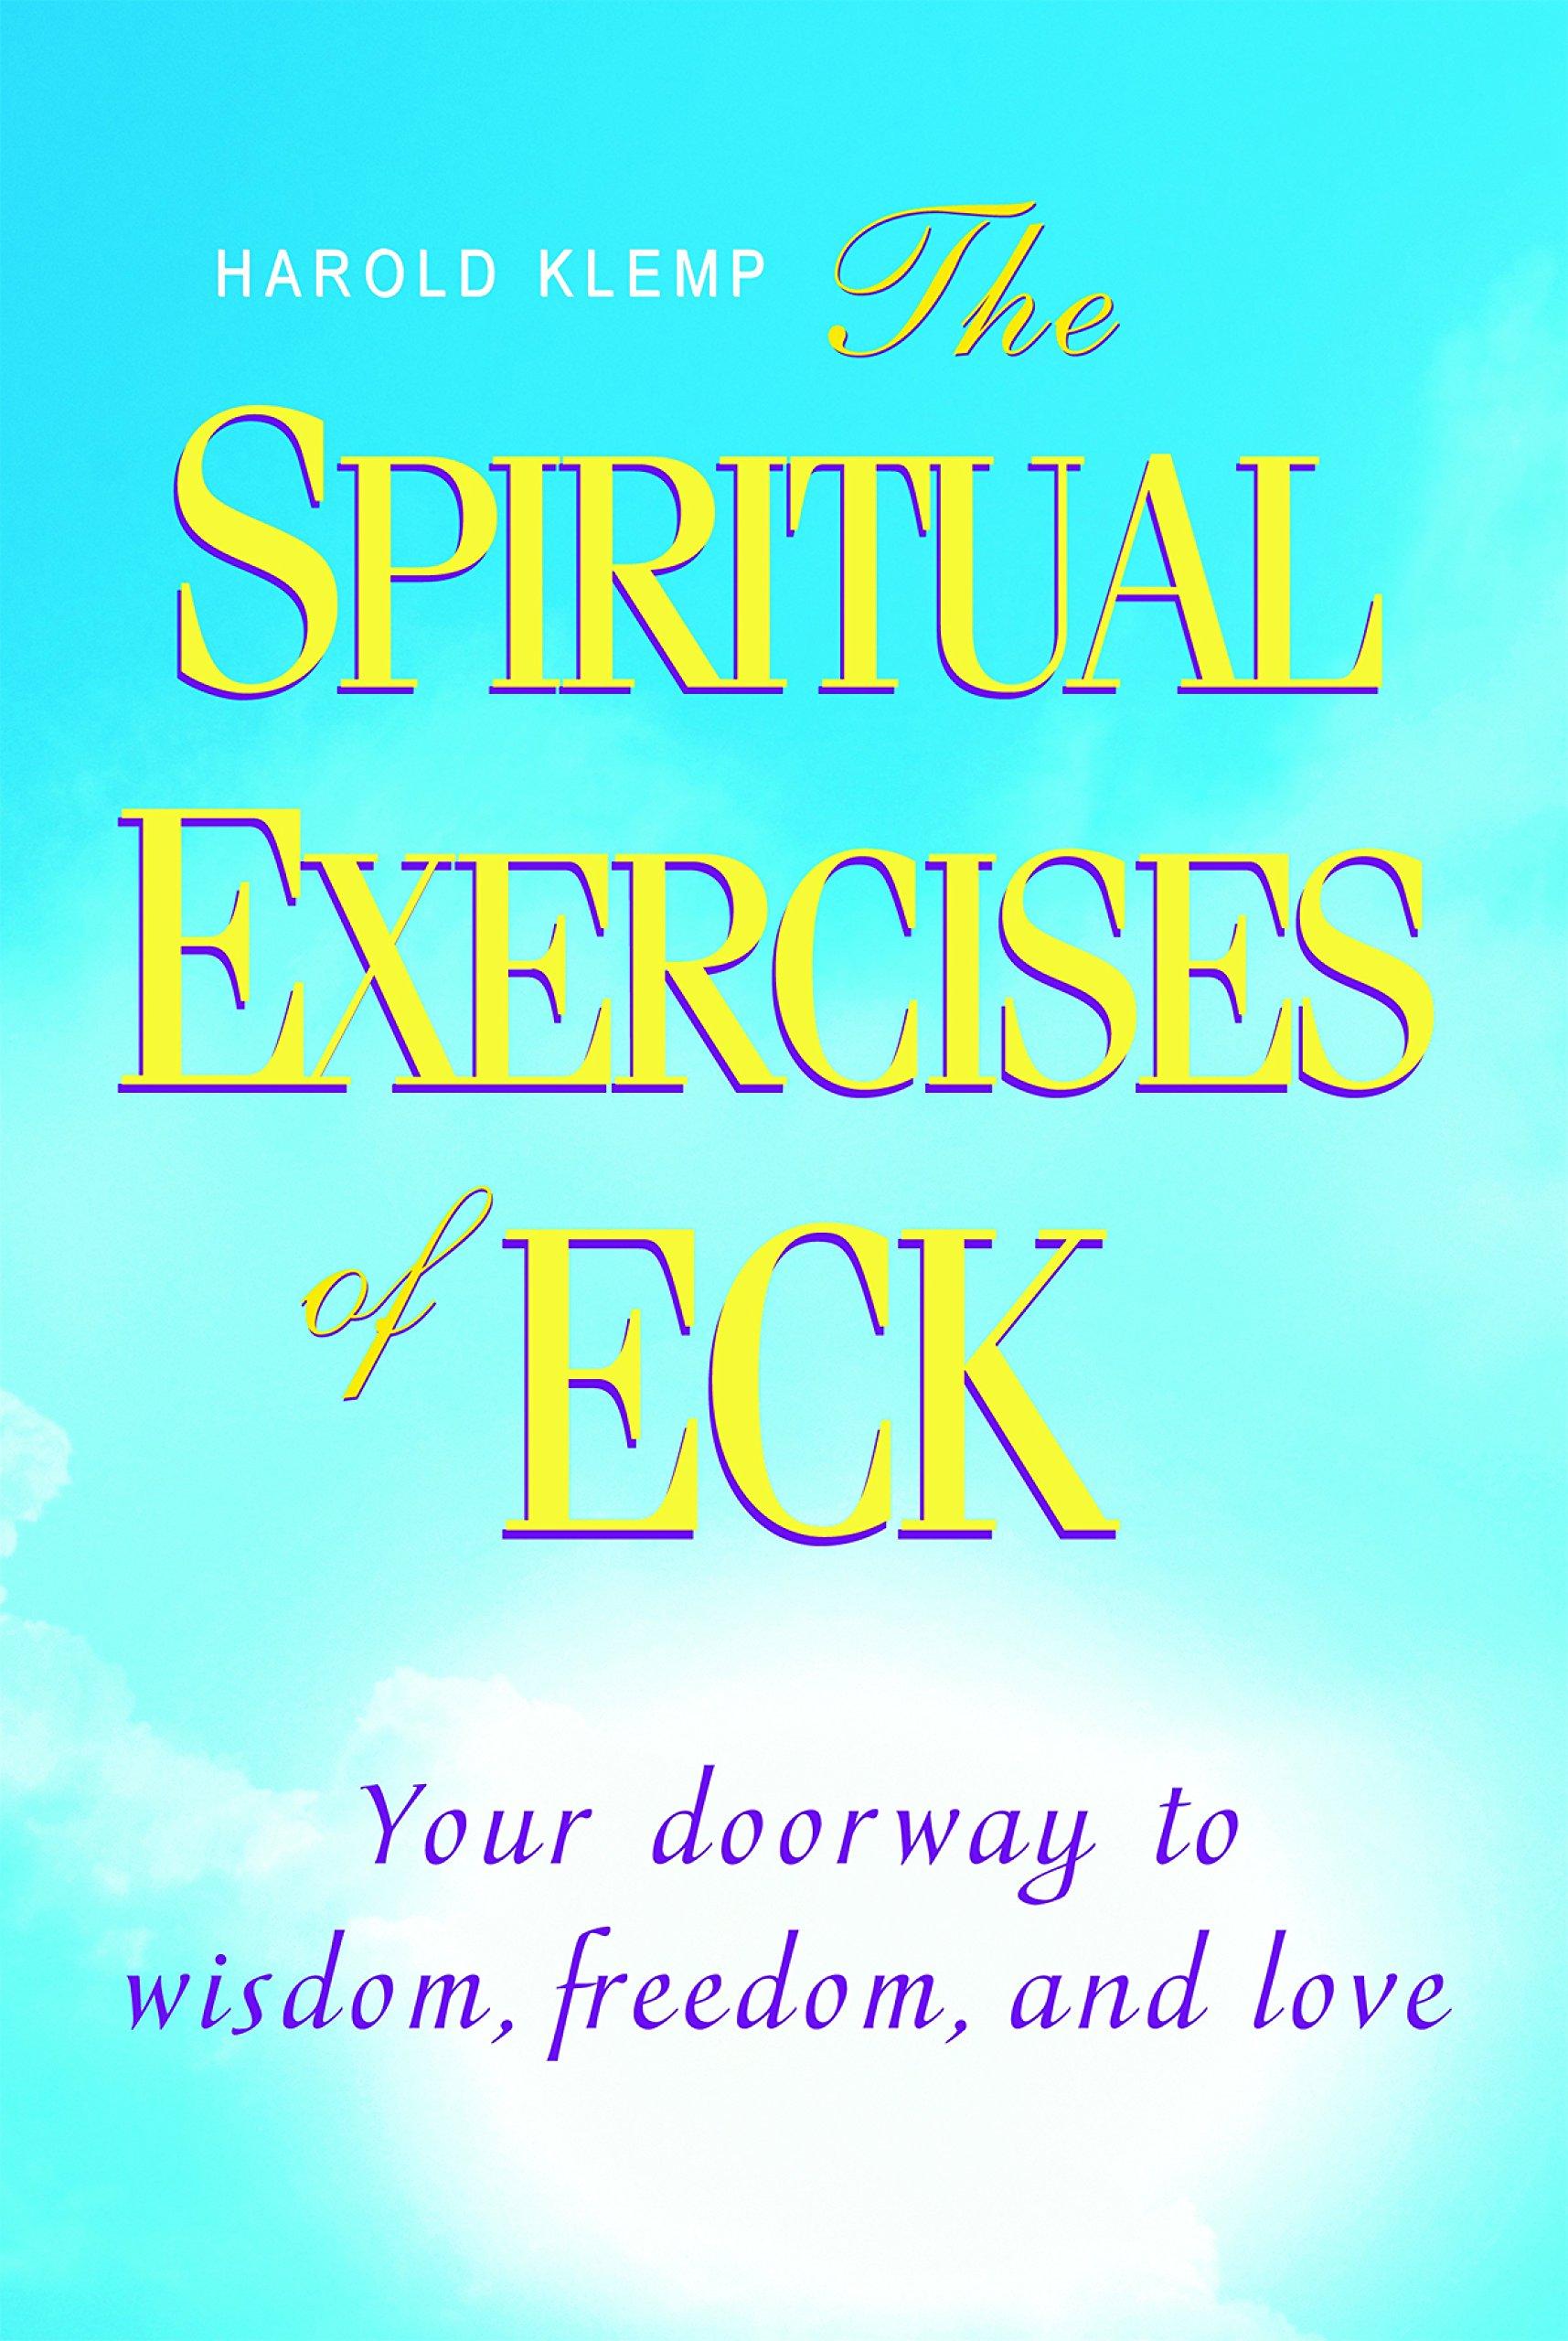 The Spiritual Exercises of ECK: Harold Klemp: 9781570433573: Amazon.com:  Books